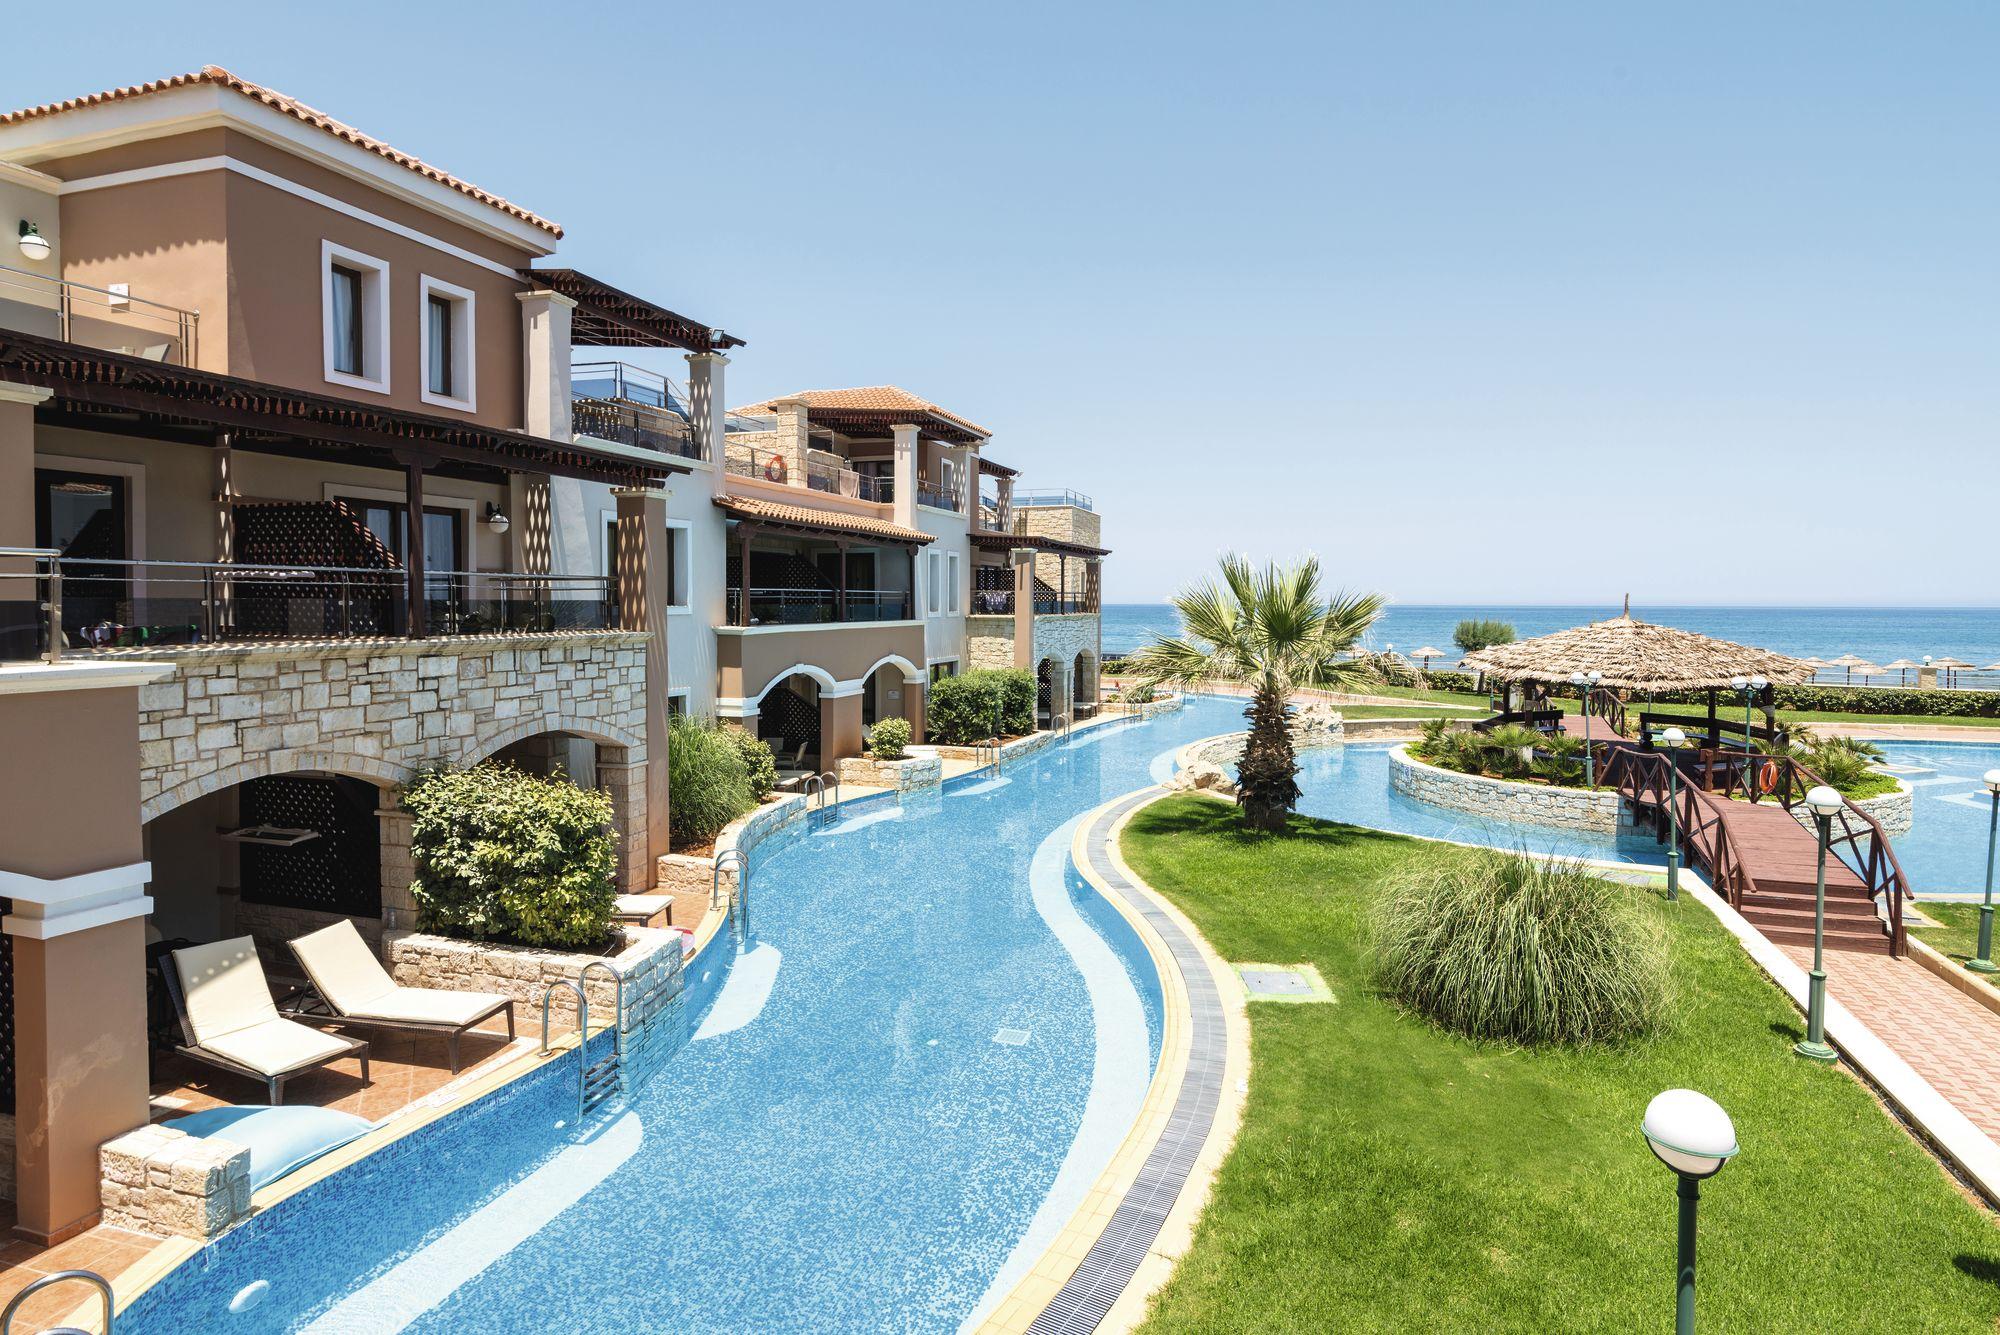 Tui Sensatori Resort Atlantica Caldera Palace Free Child